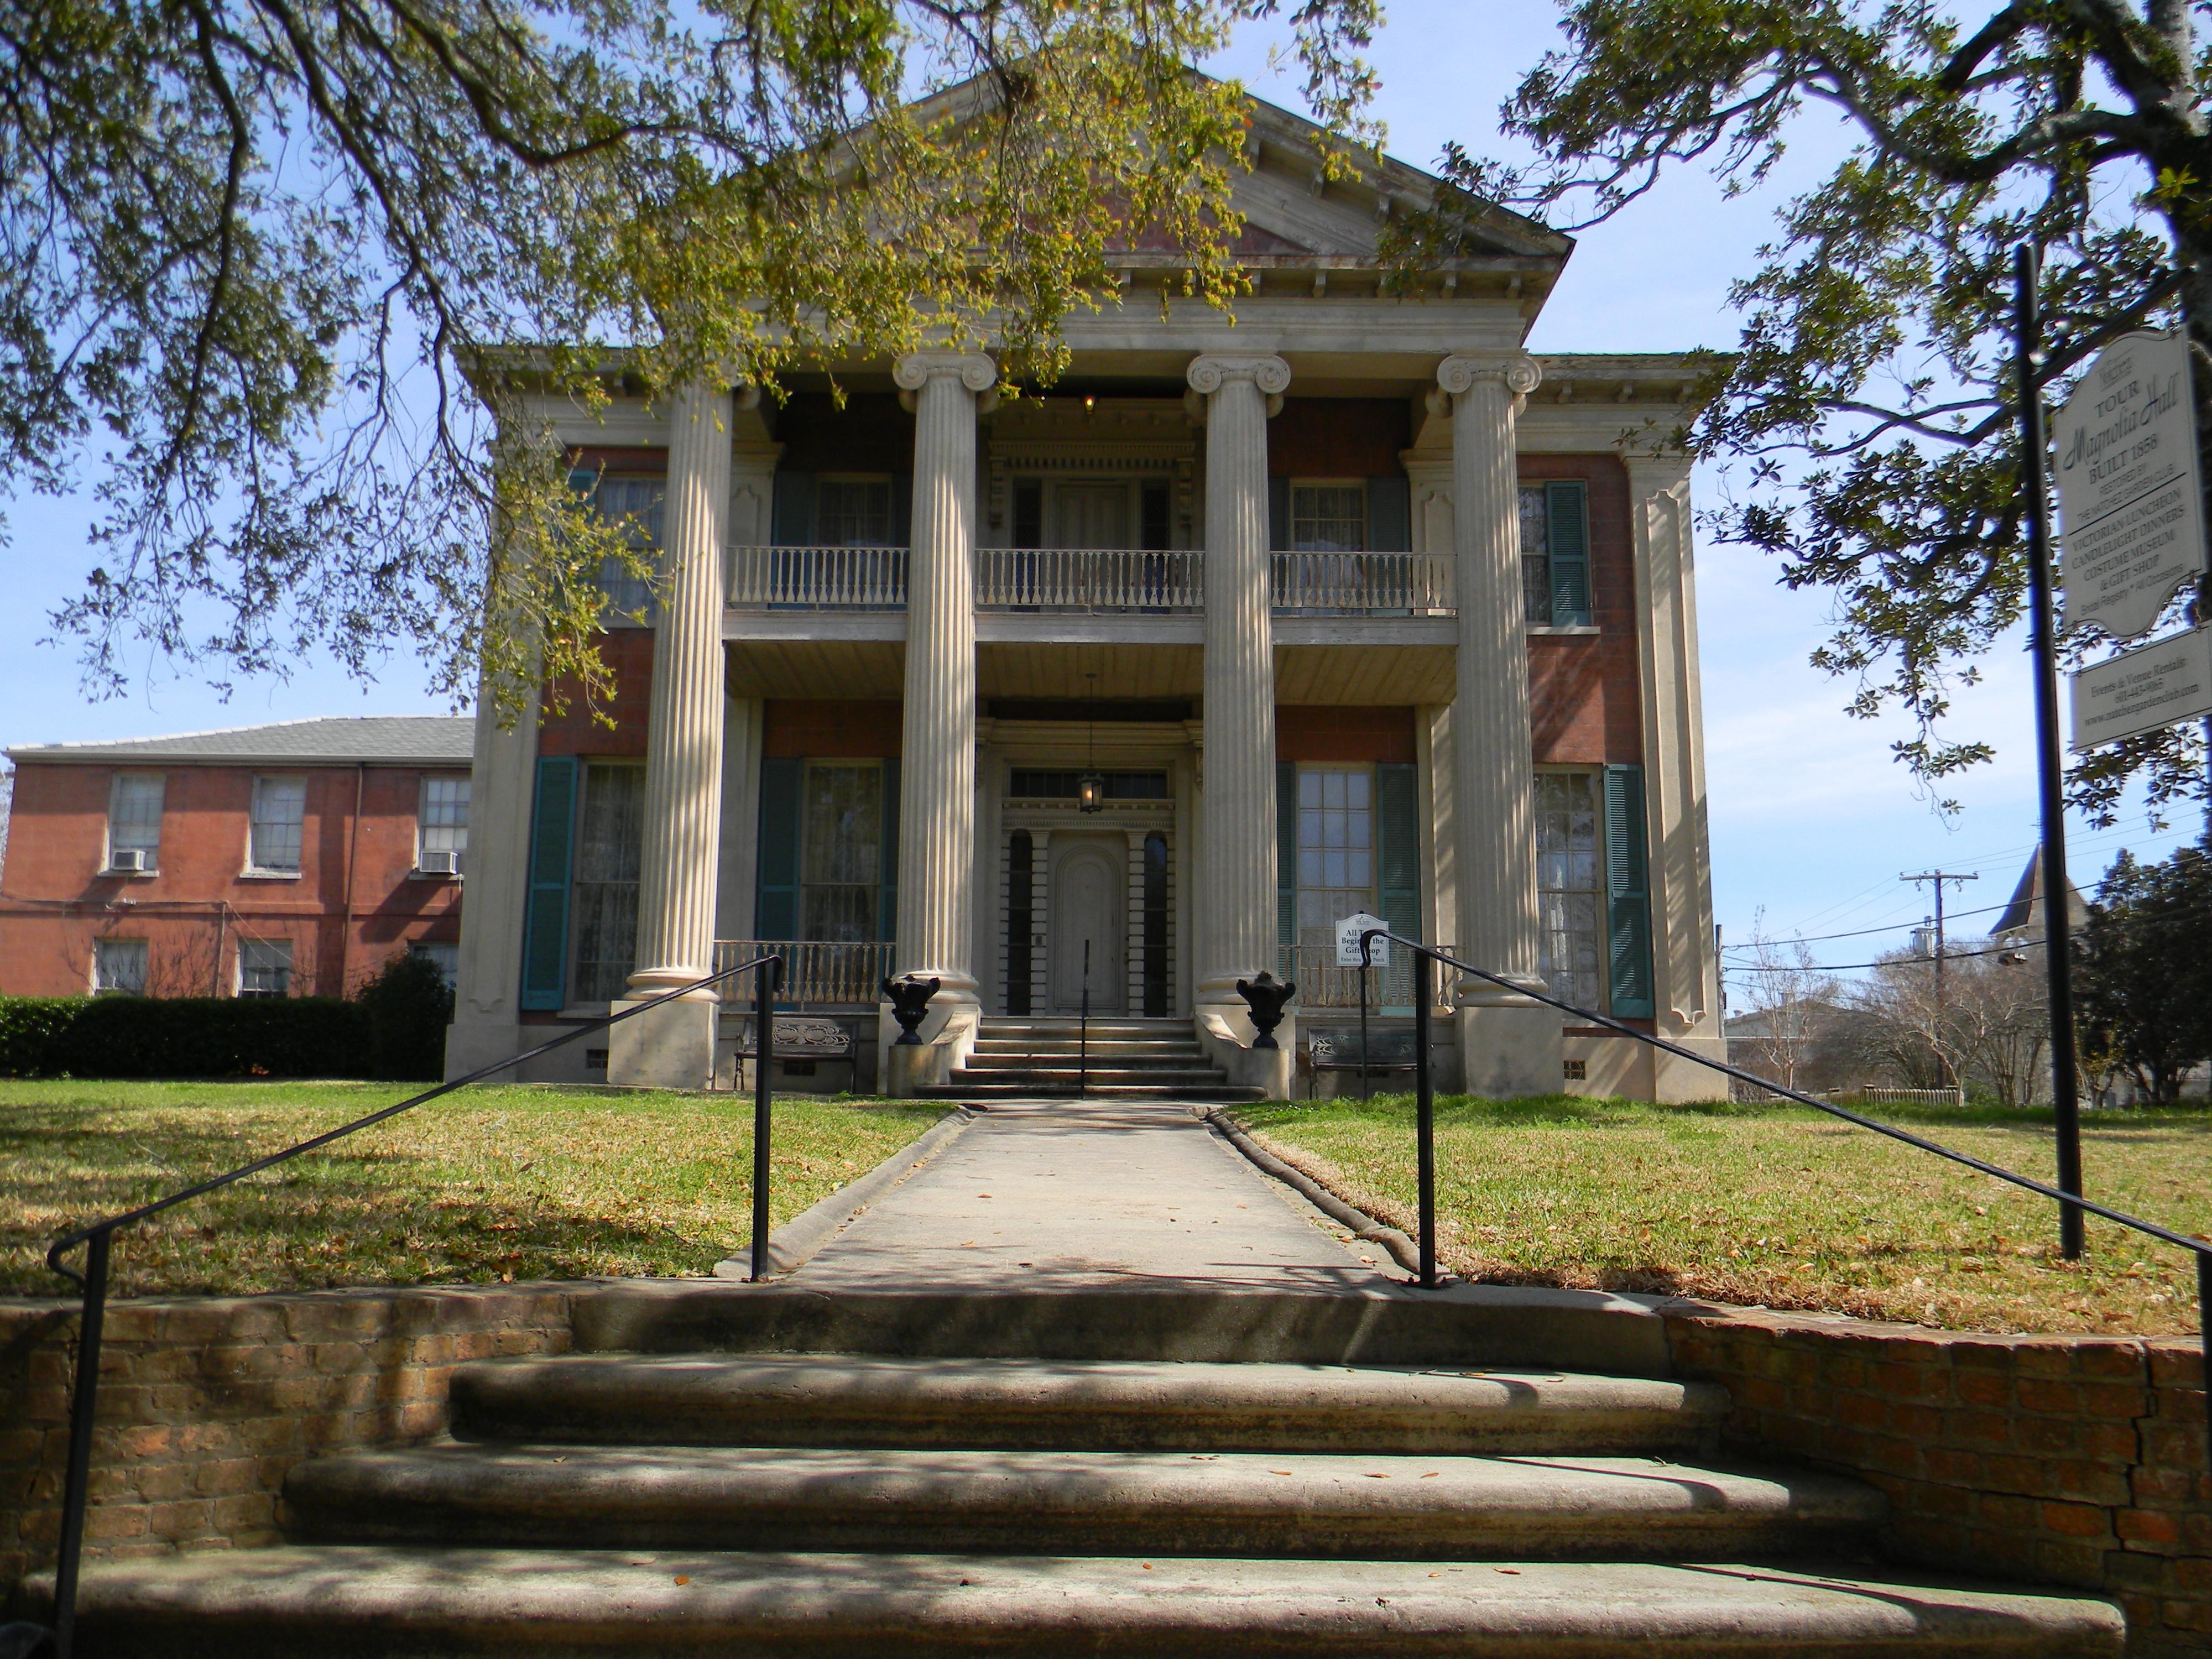 Magnolia Hall Natchez Mississippi USA Front.JPG